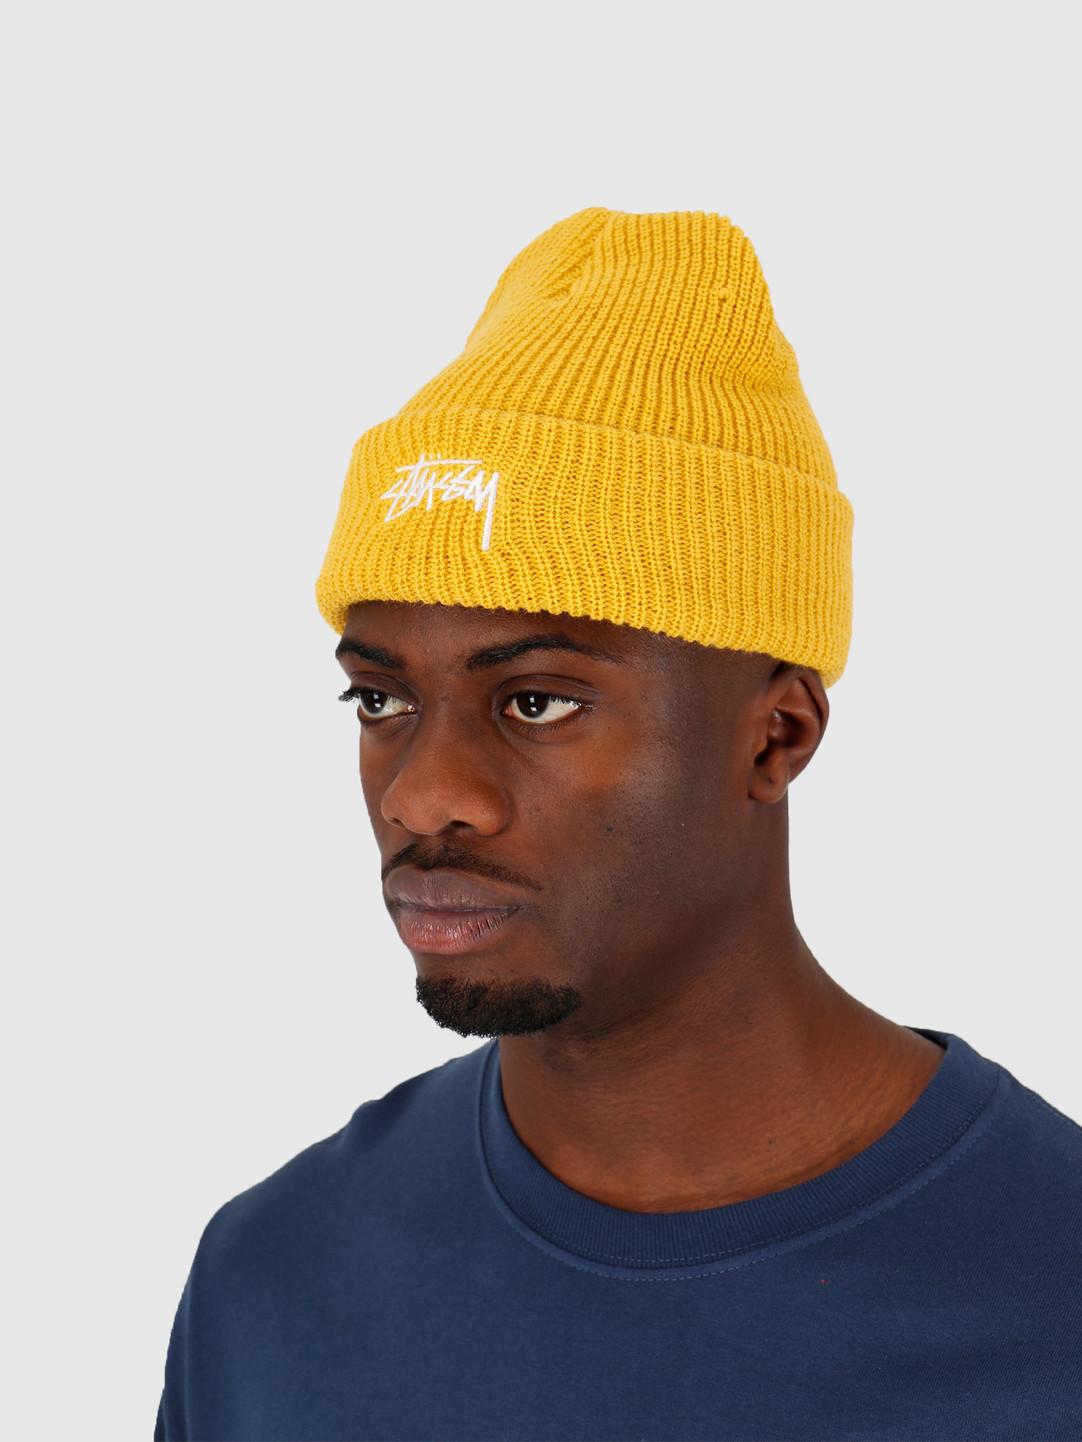 Stussy Stussy Ho19 Stock Cuff Beanie Saffron Yellow 132953